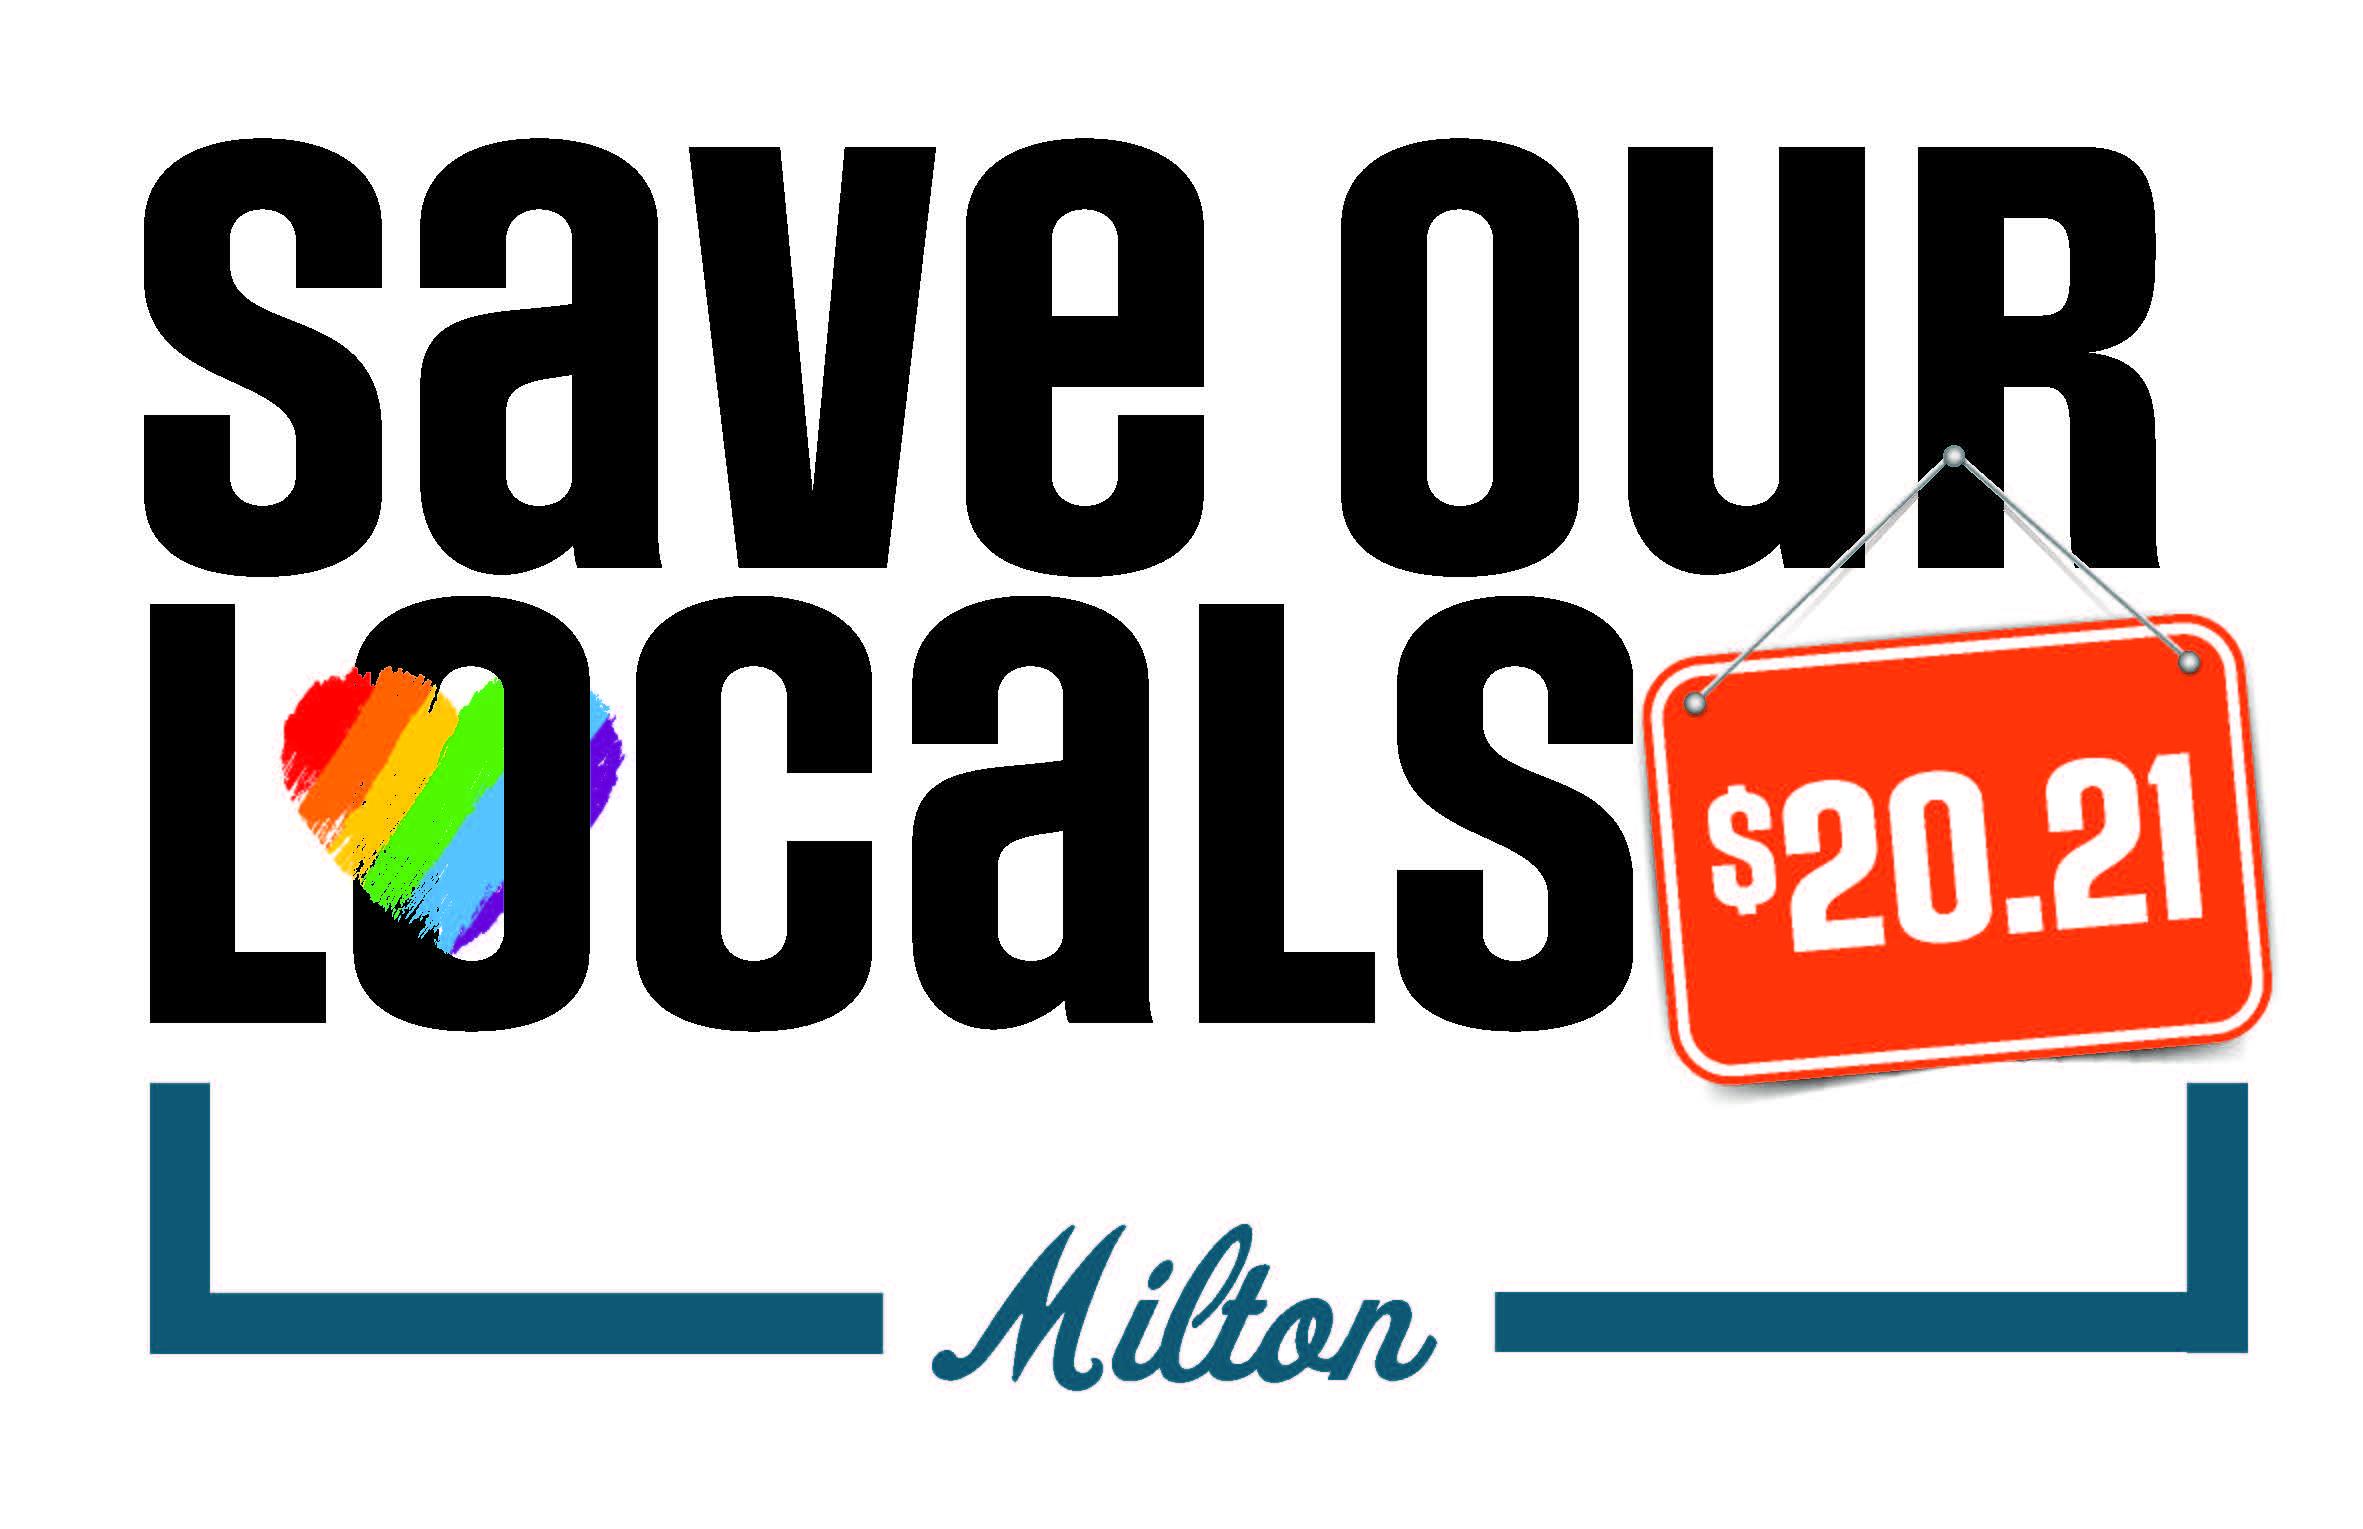 Save Our Locals 2021 Milton